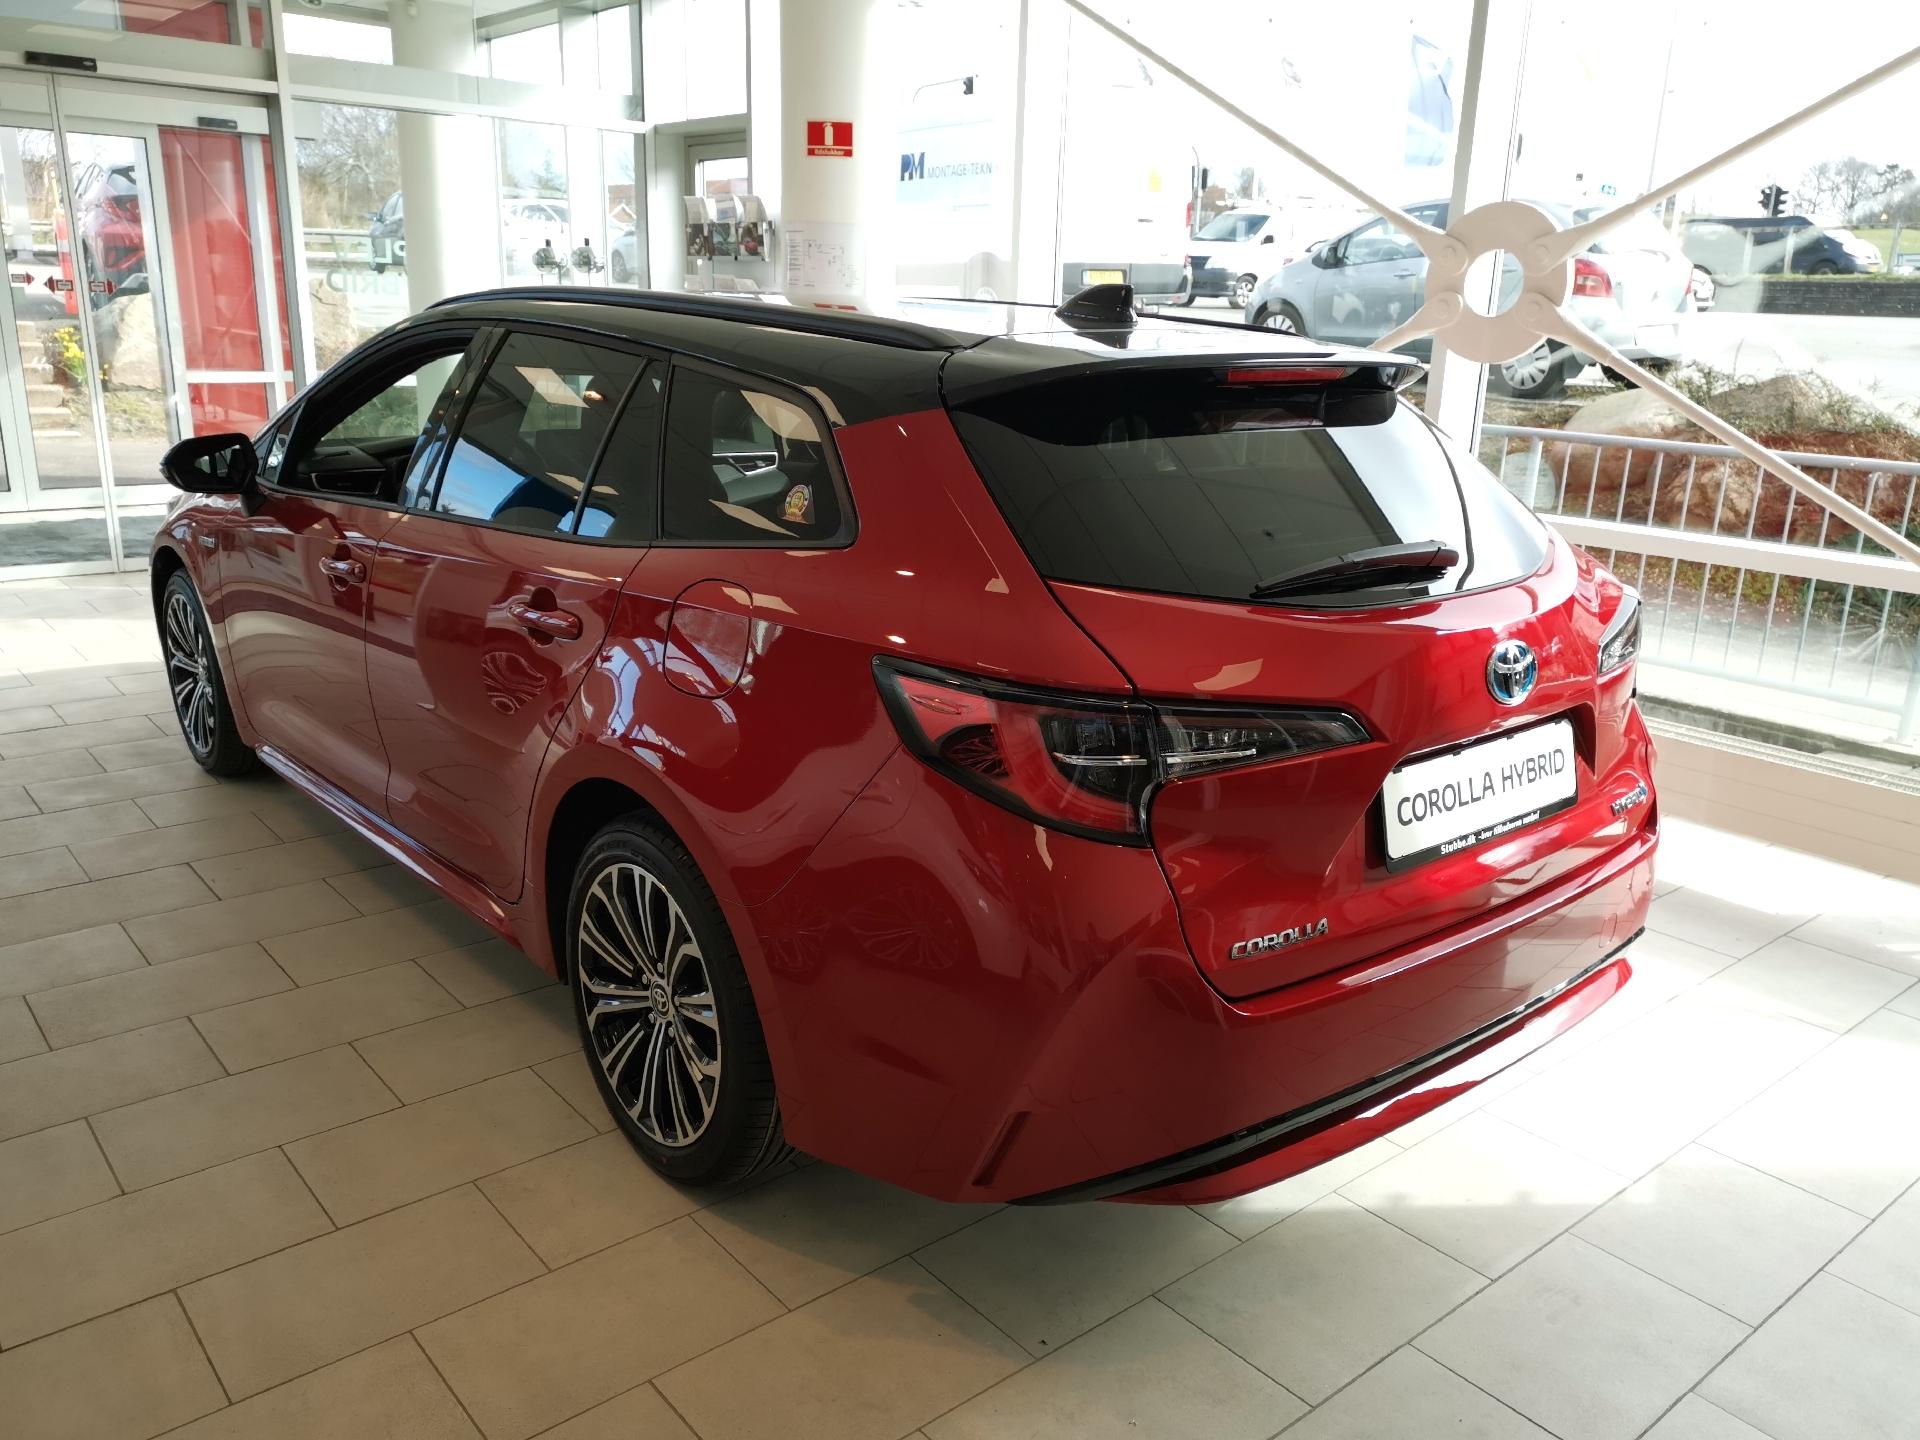 Billede af Toyota Corolla Touring Sports 1,8 B/EL H3 Premiumpakke E-CVT 122HK Stc Trinl. Gear